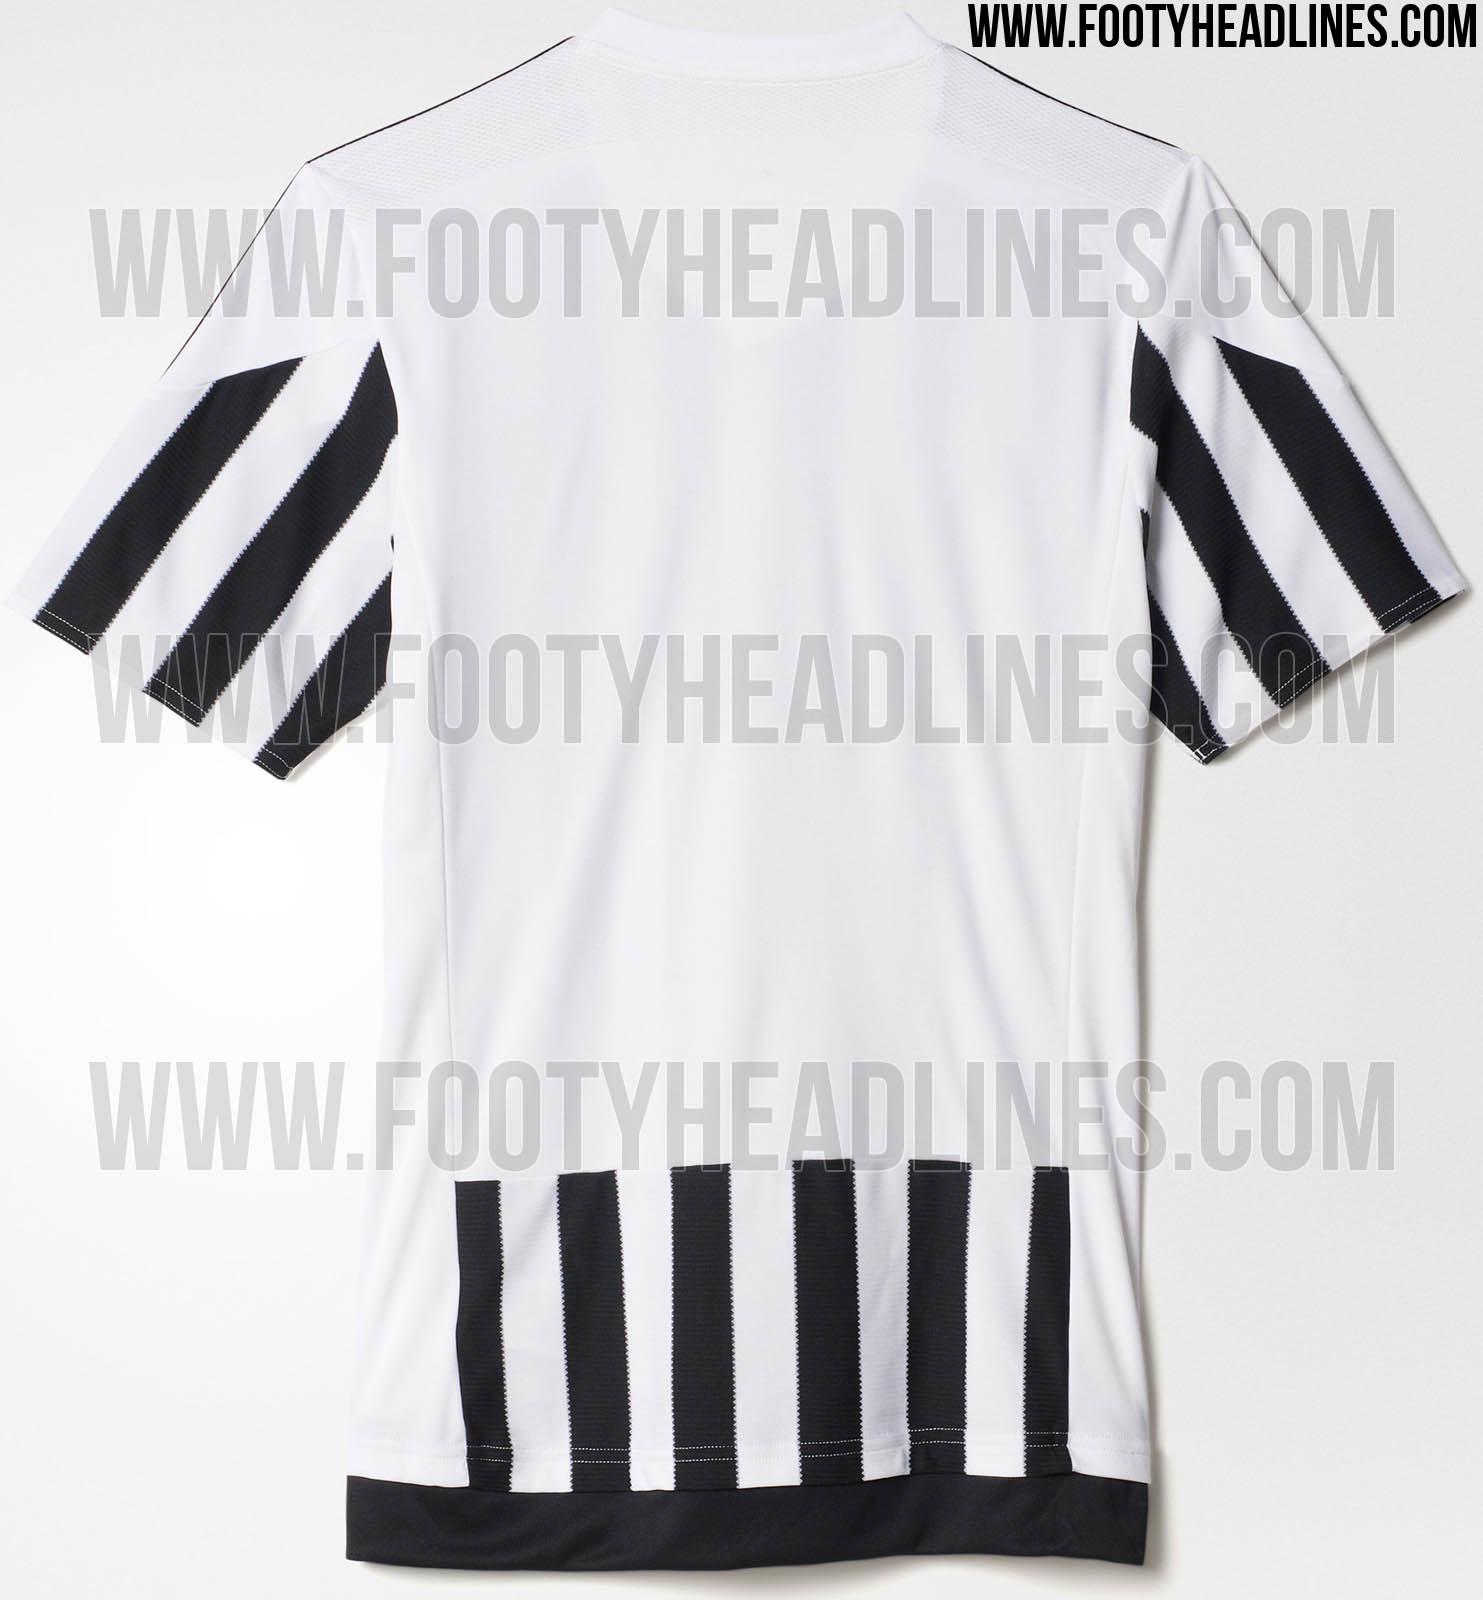 san francisco d03ad 73934 Adidas Juventus 15-16 Kits Released - Nemo 4 Shop